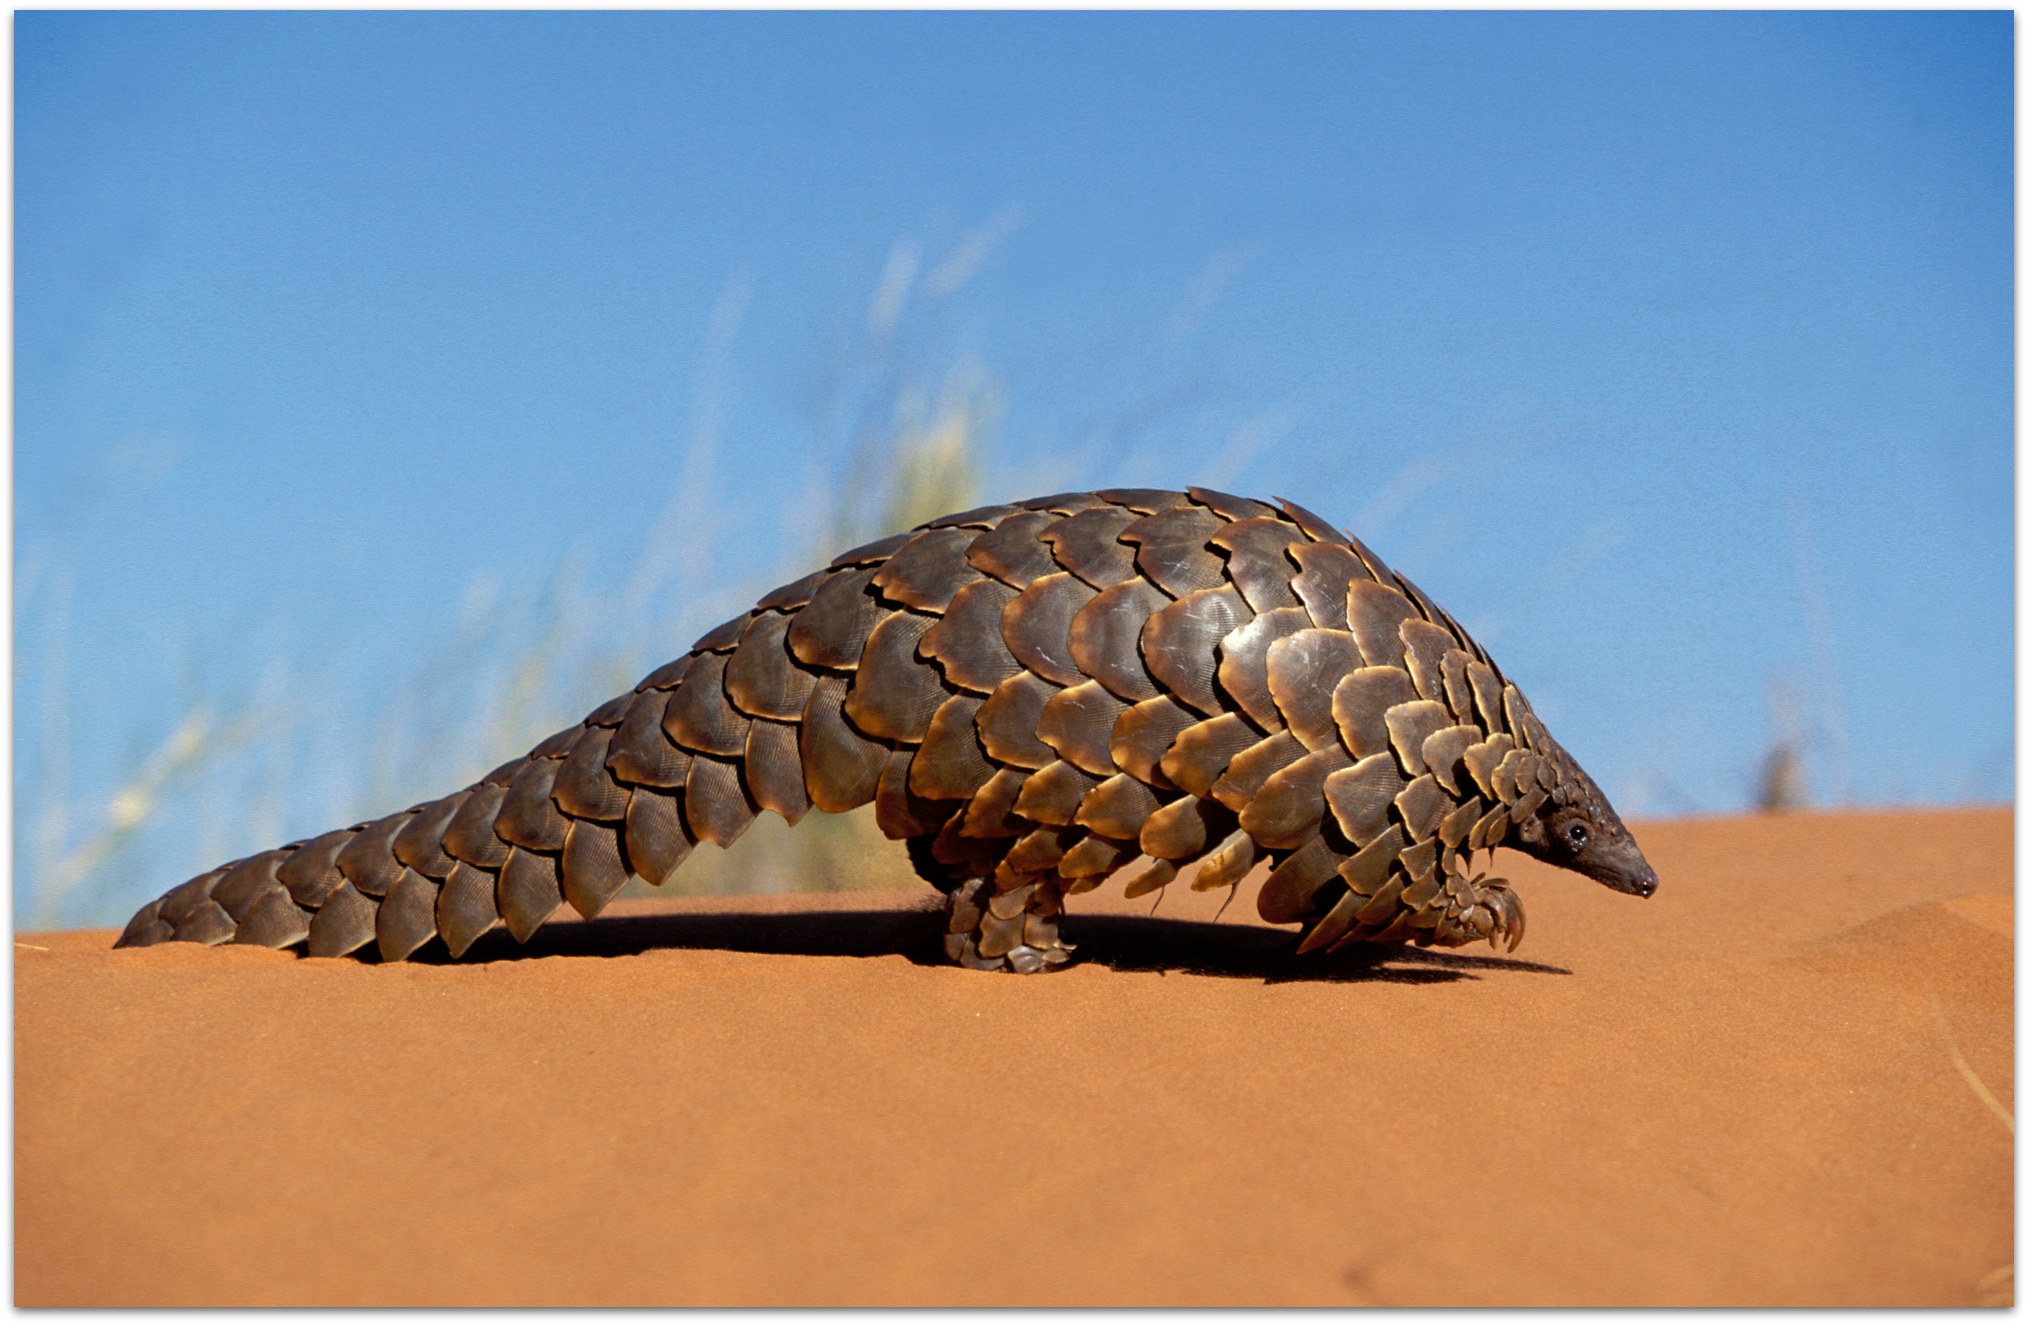 Pangolin on sand dune © Nigel Dennis